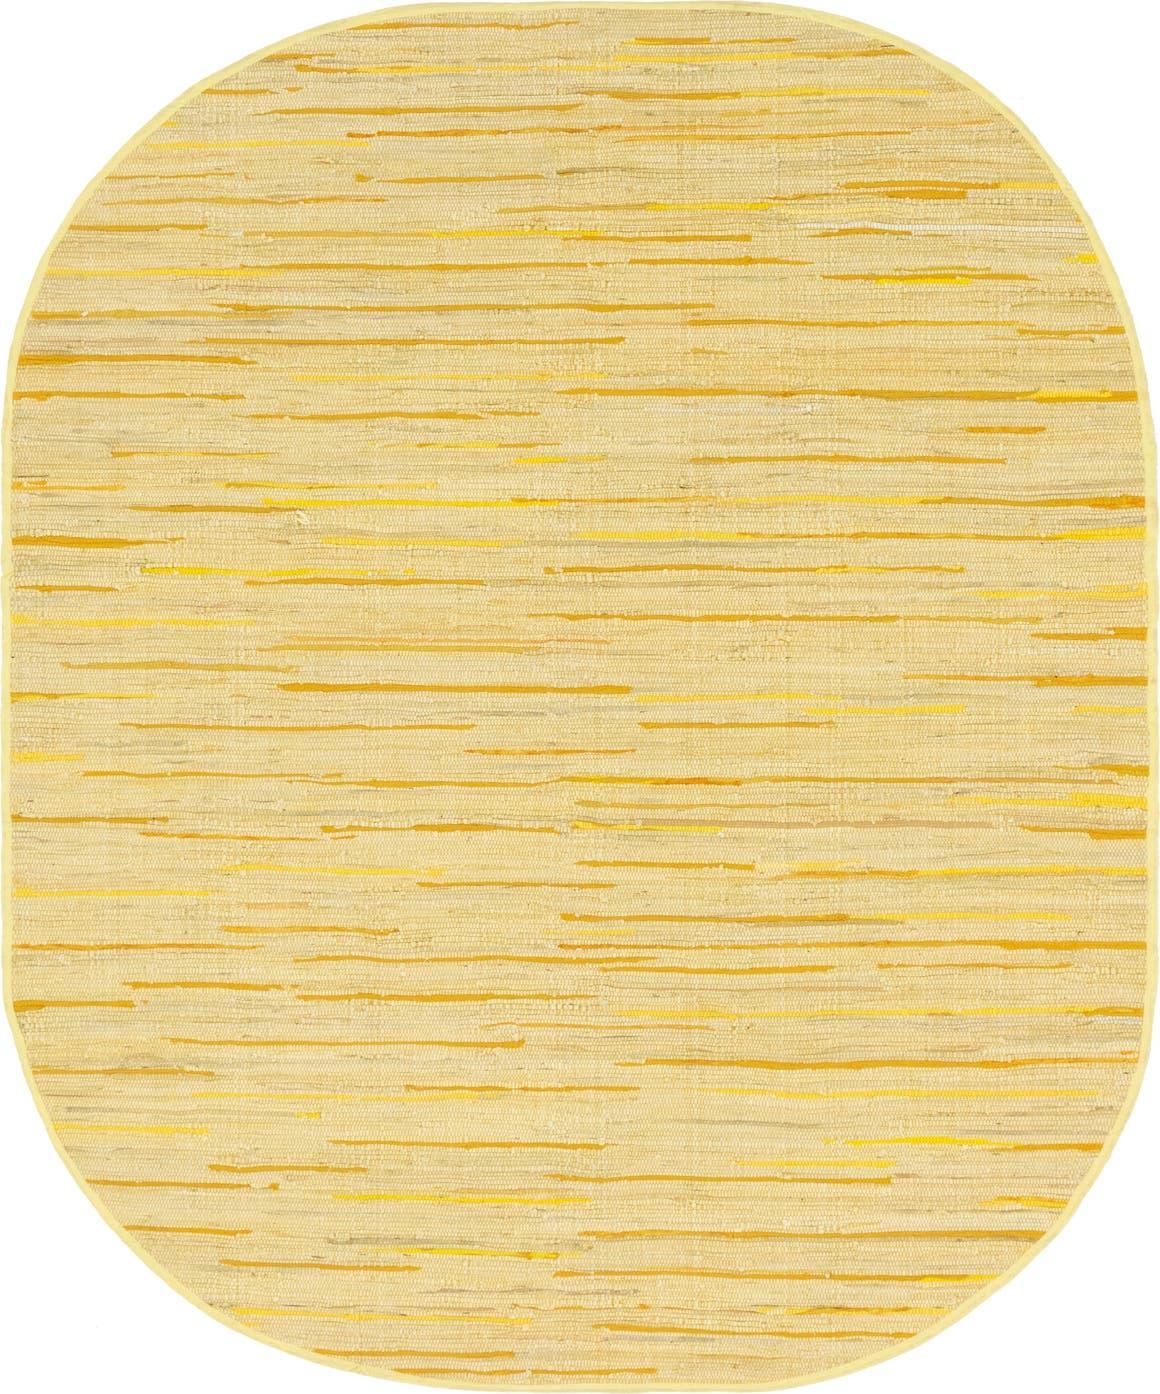 8' x 10' Chindi Cotton Oval Rug main image